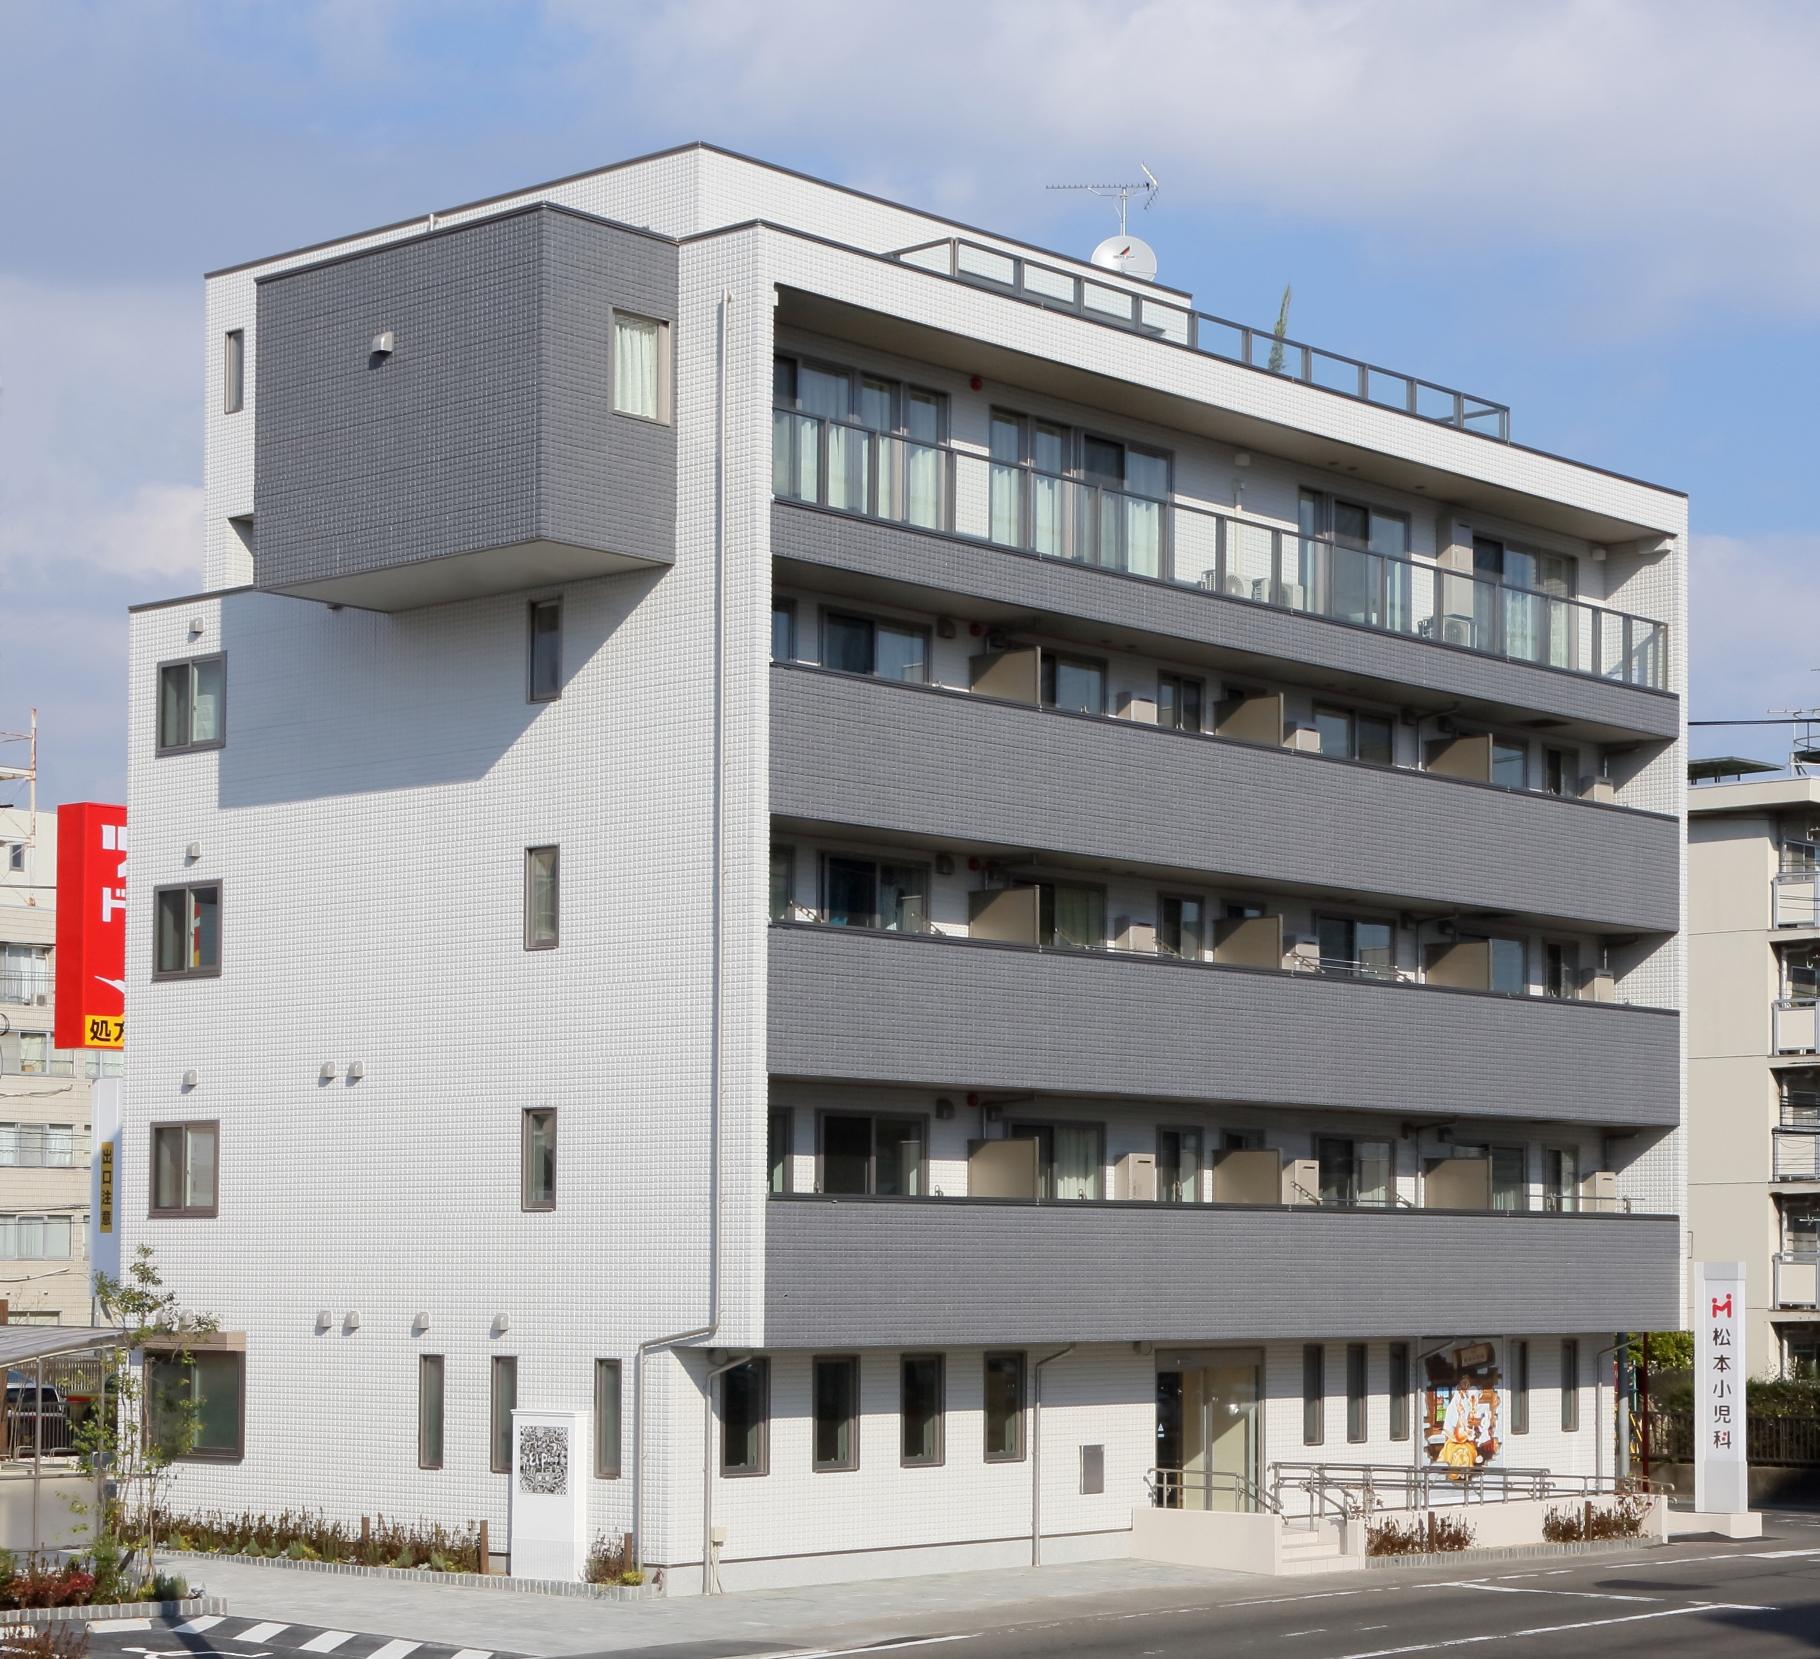 【Vieuno】6階建 太白区ビル(自宅・医院・賃貸併用プラン)